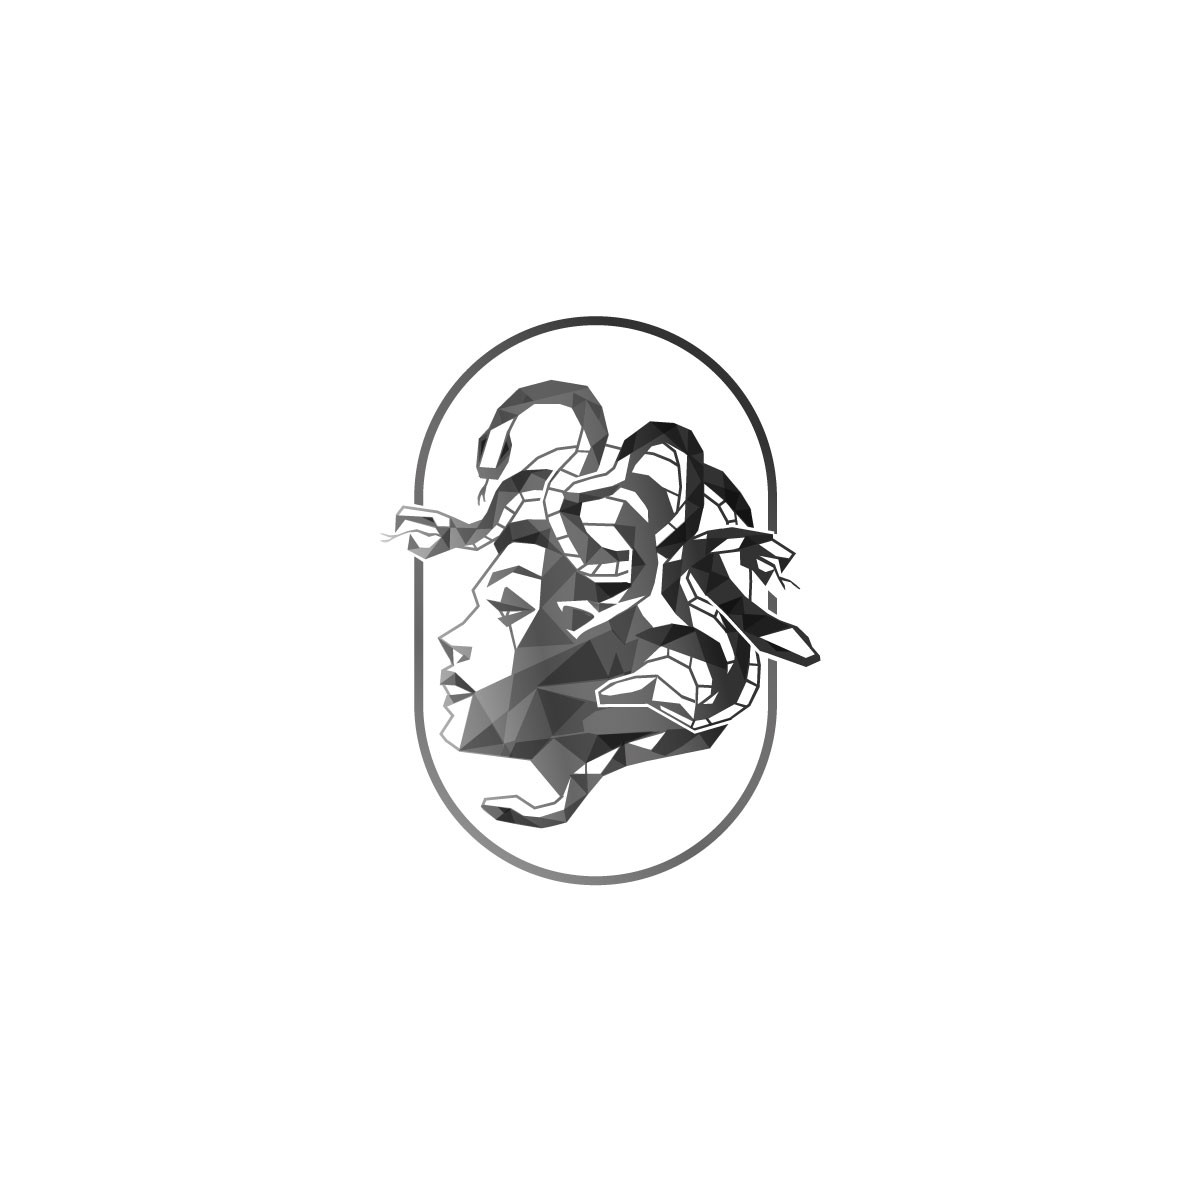 Design a low poly Medusa head for our kombucha company